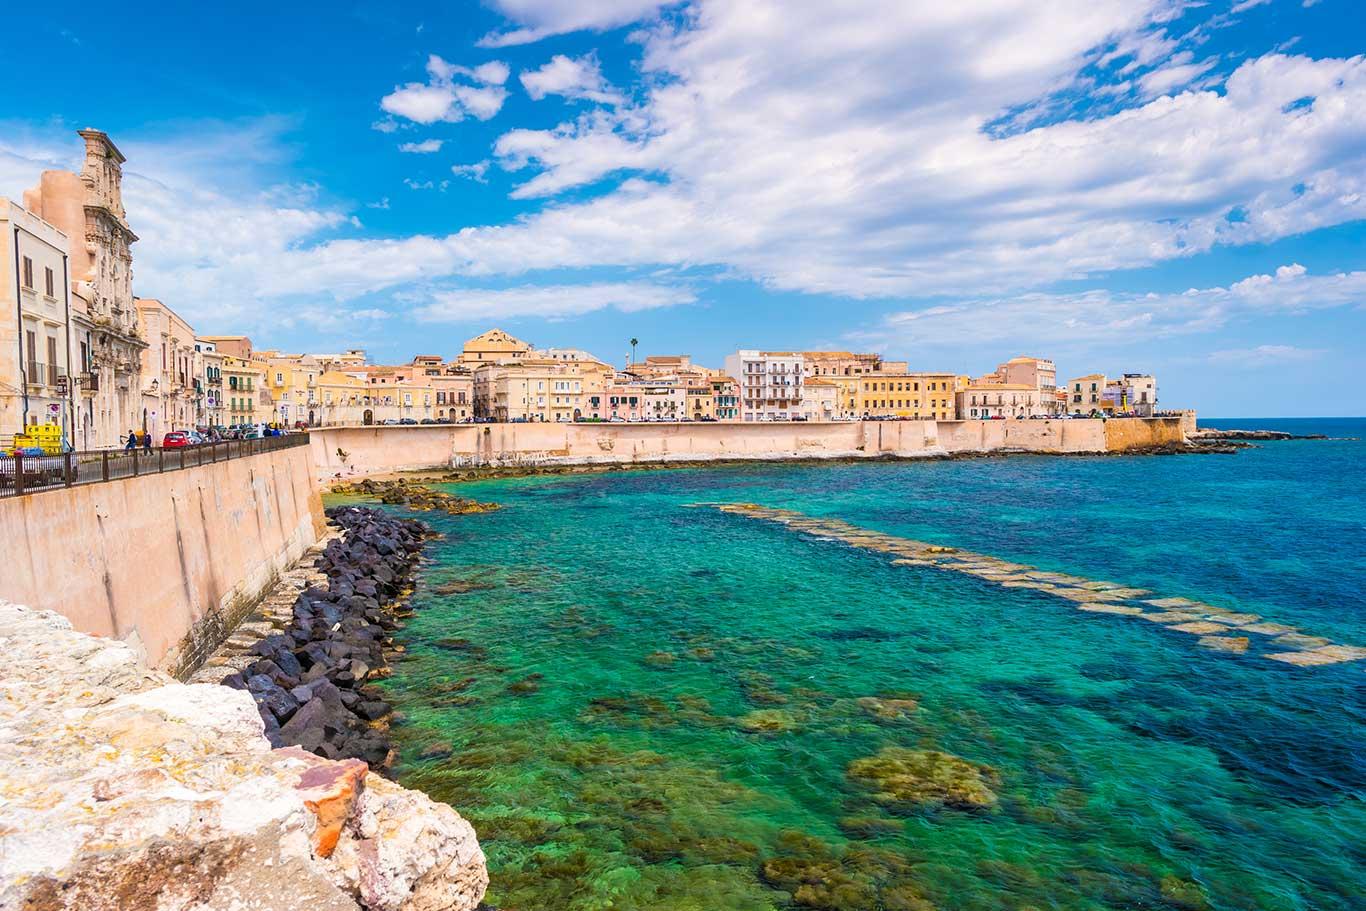 italie-sicile-syracuse-ortigia-weekend-romantique-amoureux